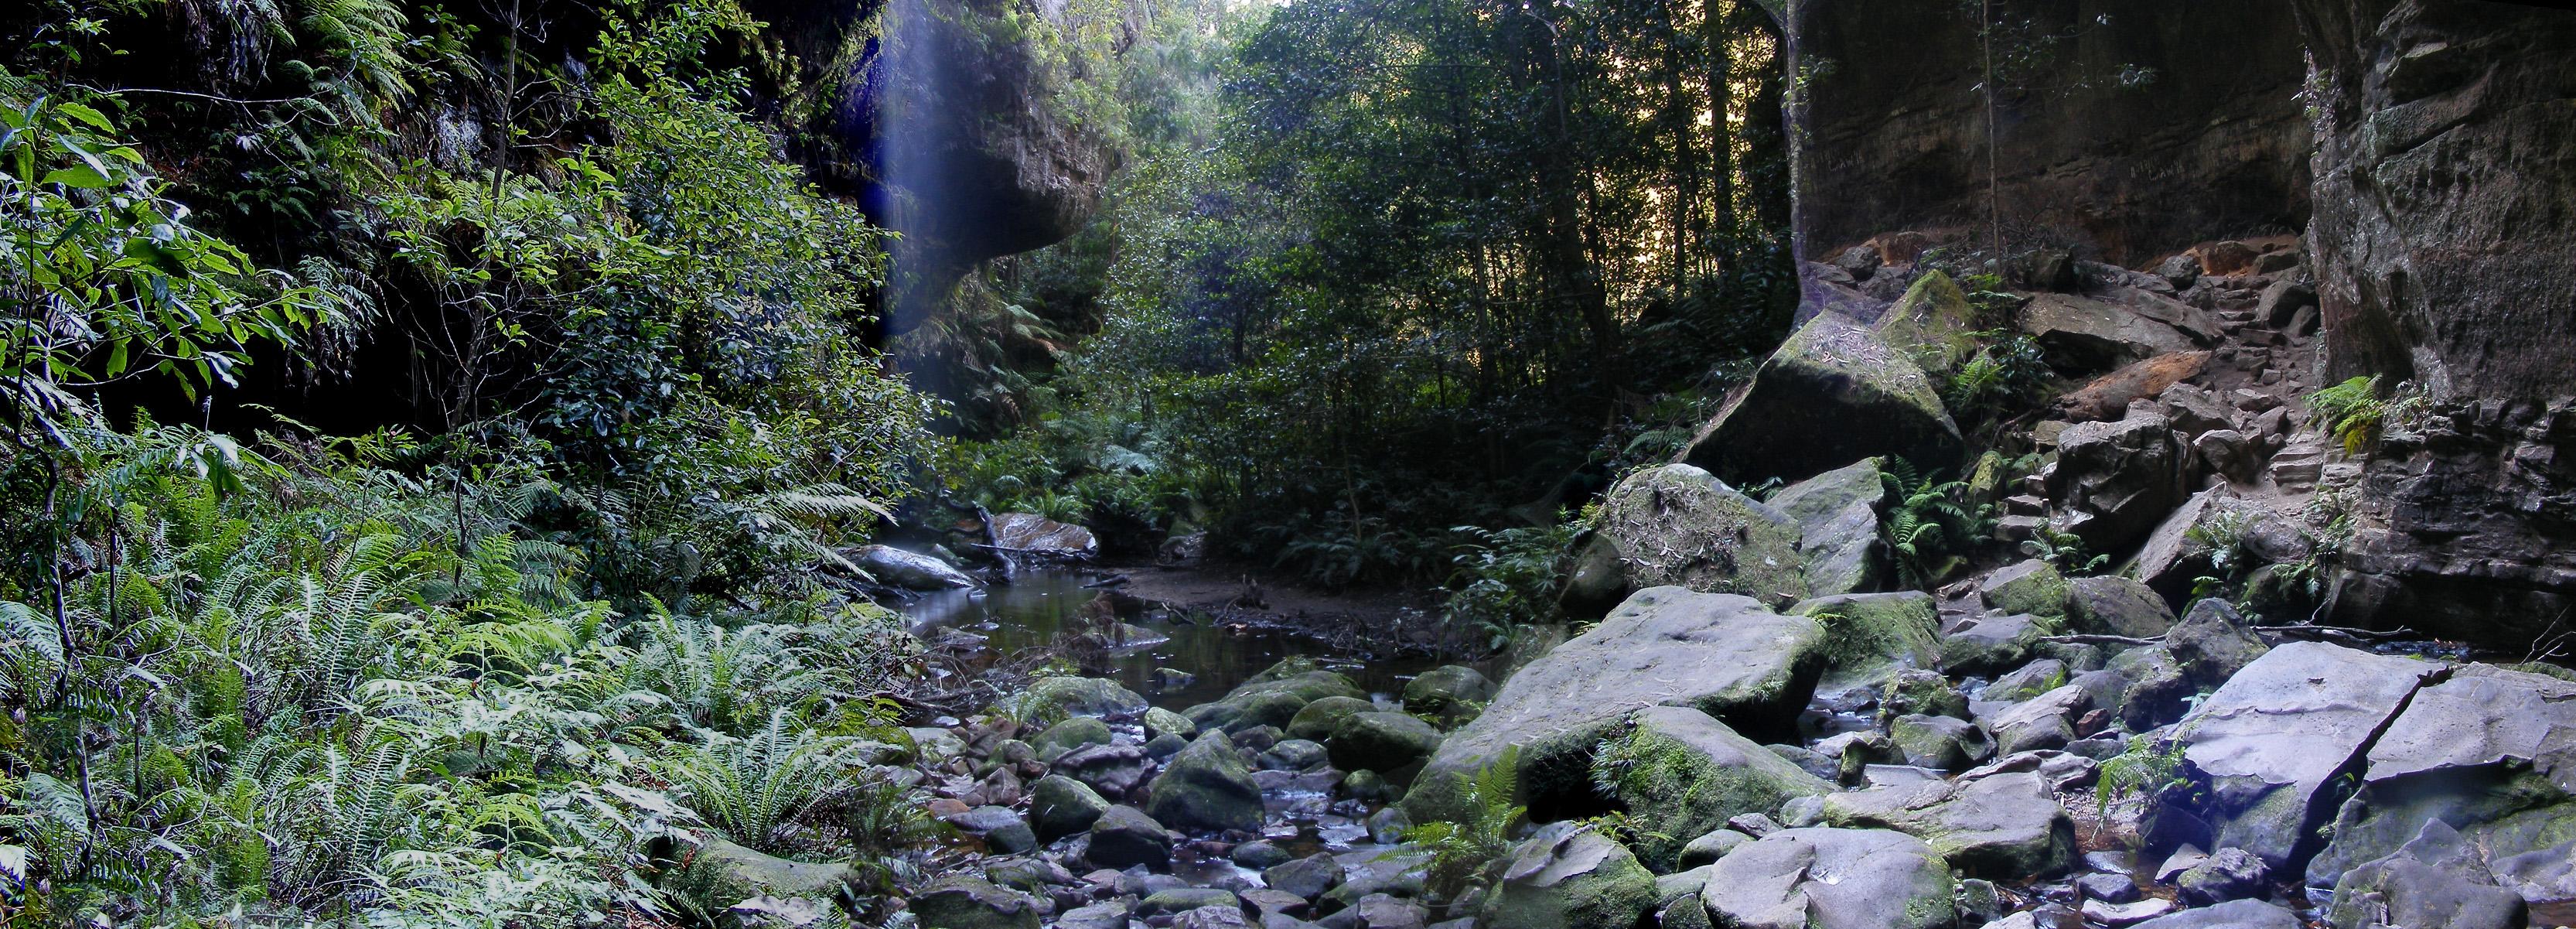 Green Tree Python Habitat